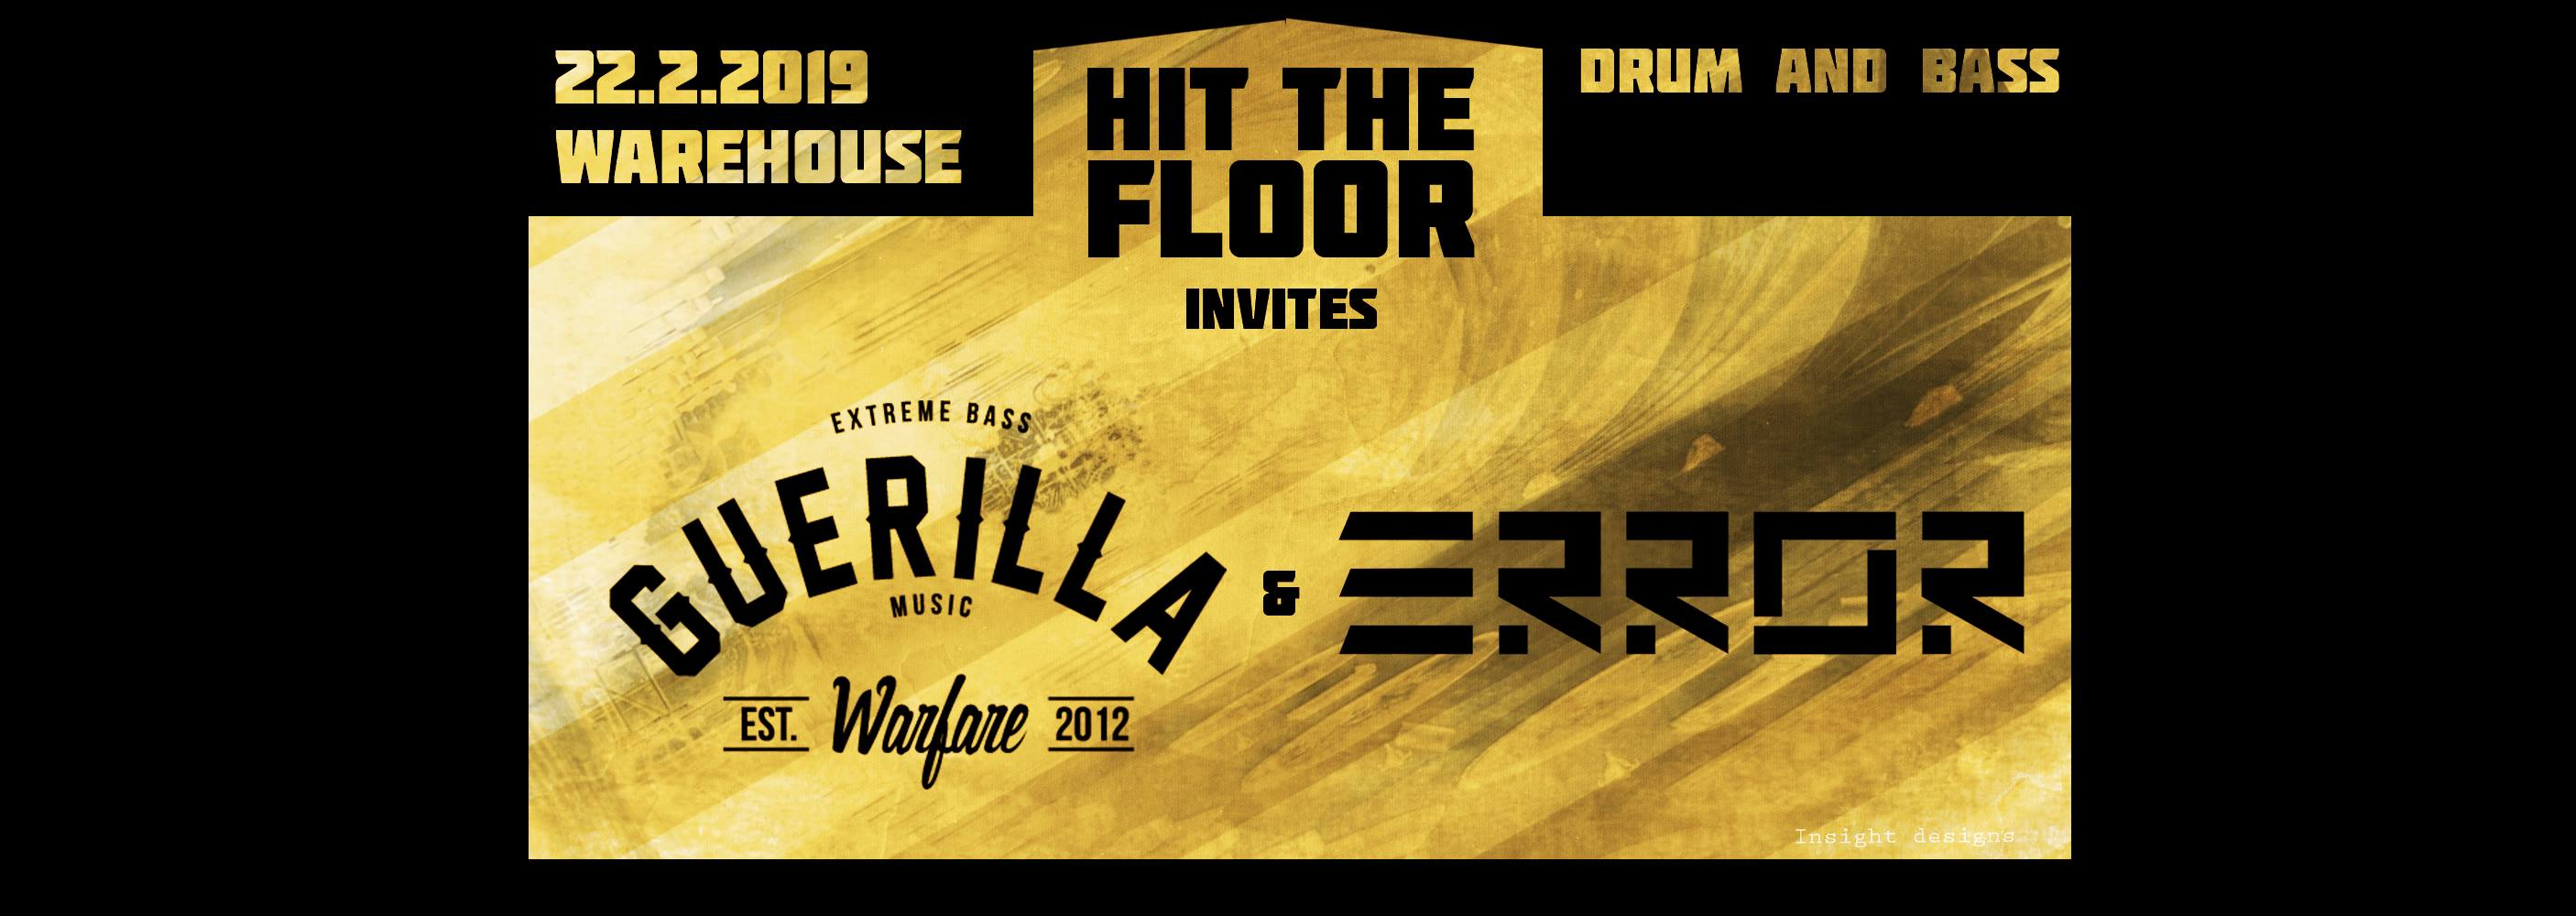 Hit the Floor invites GWM x ERROR